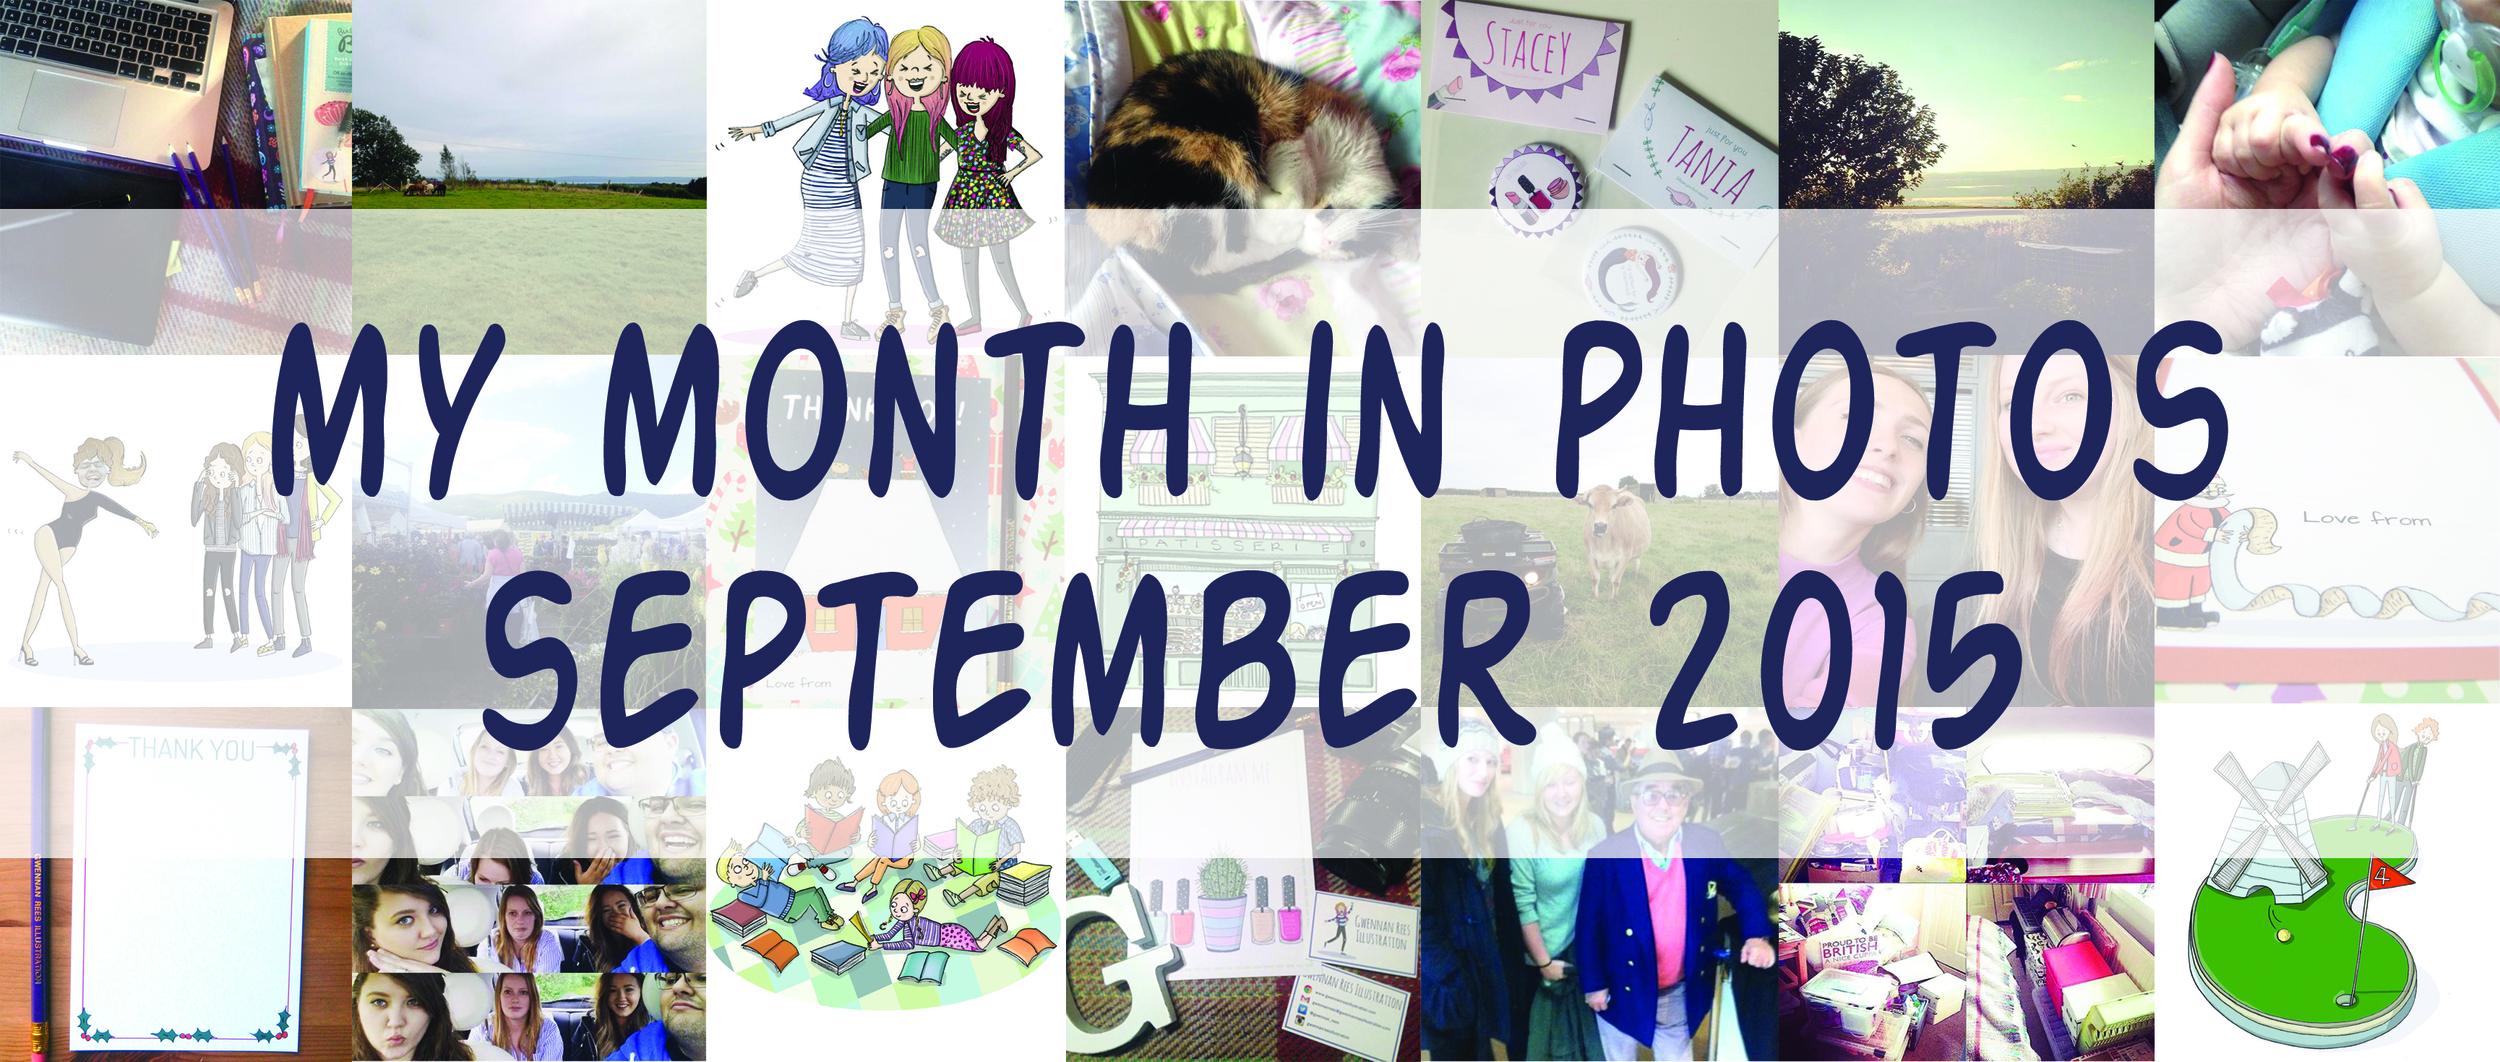 september month photos